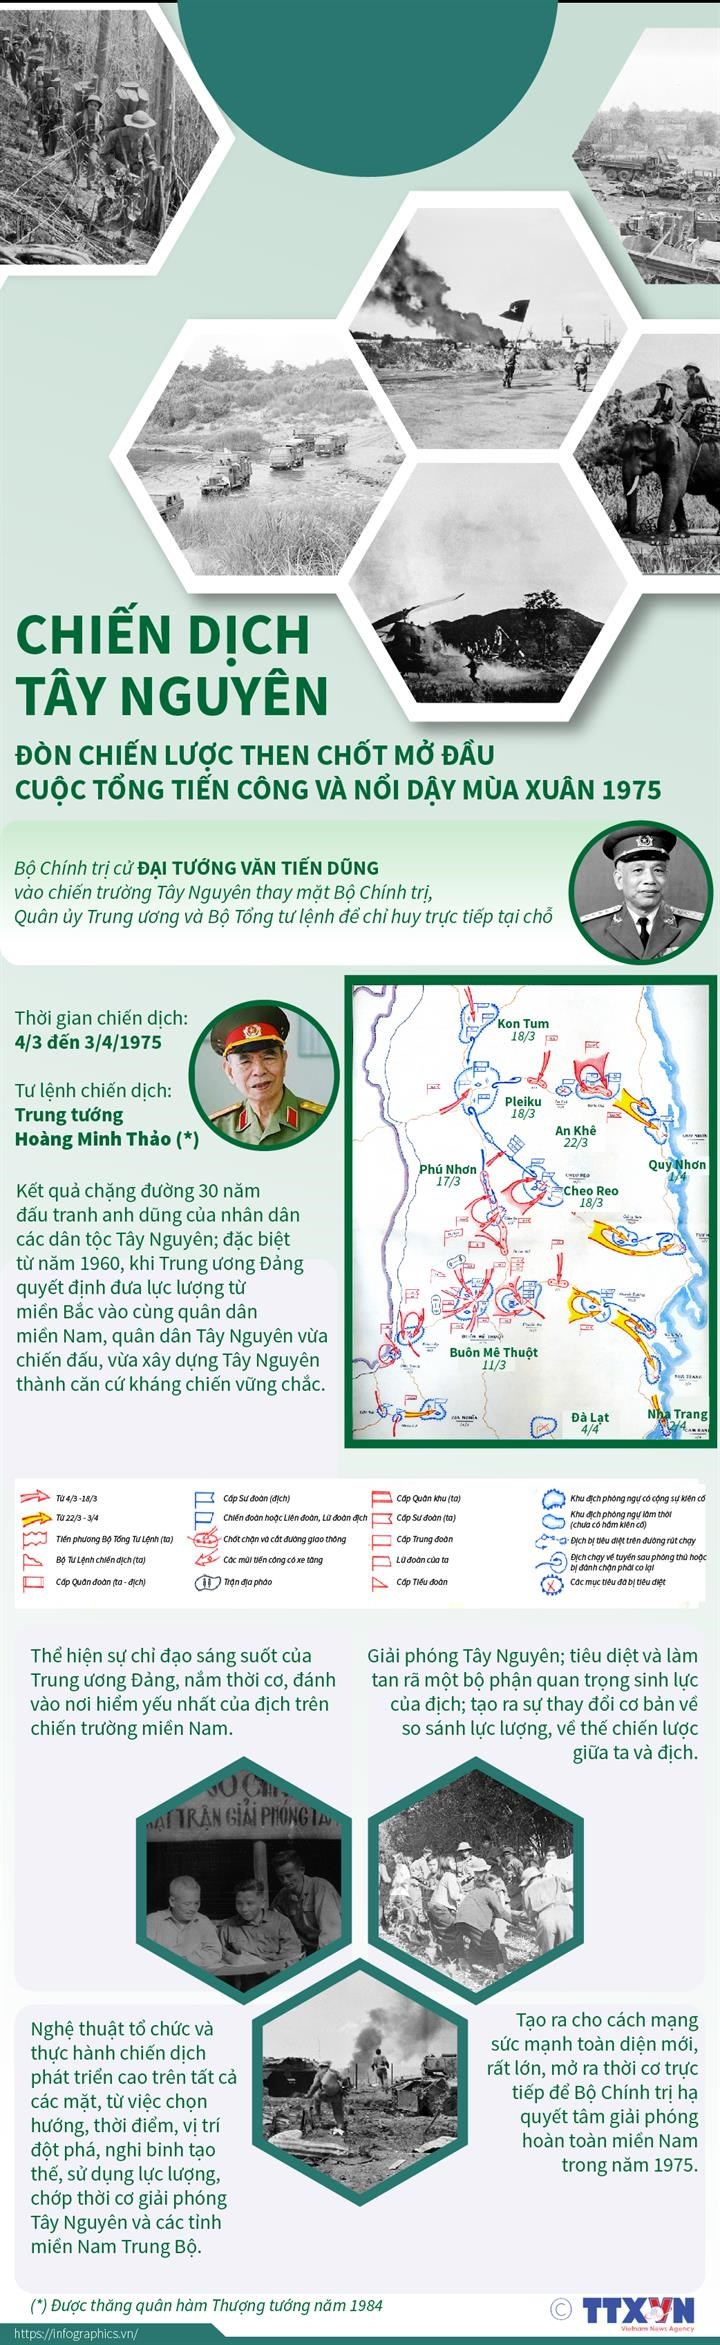 Chien dich Tay Nguyen: Don chien luoc mo dau cuoc Tong tien cong 1975 hinh anh 1